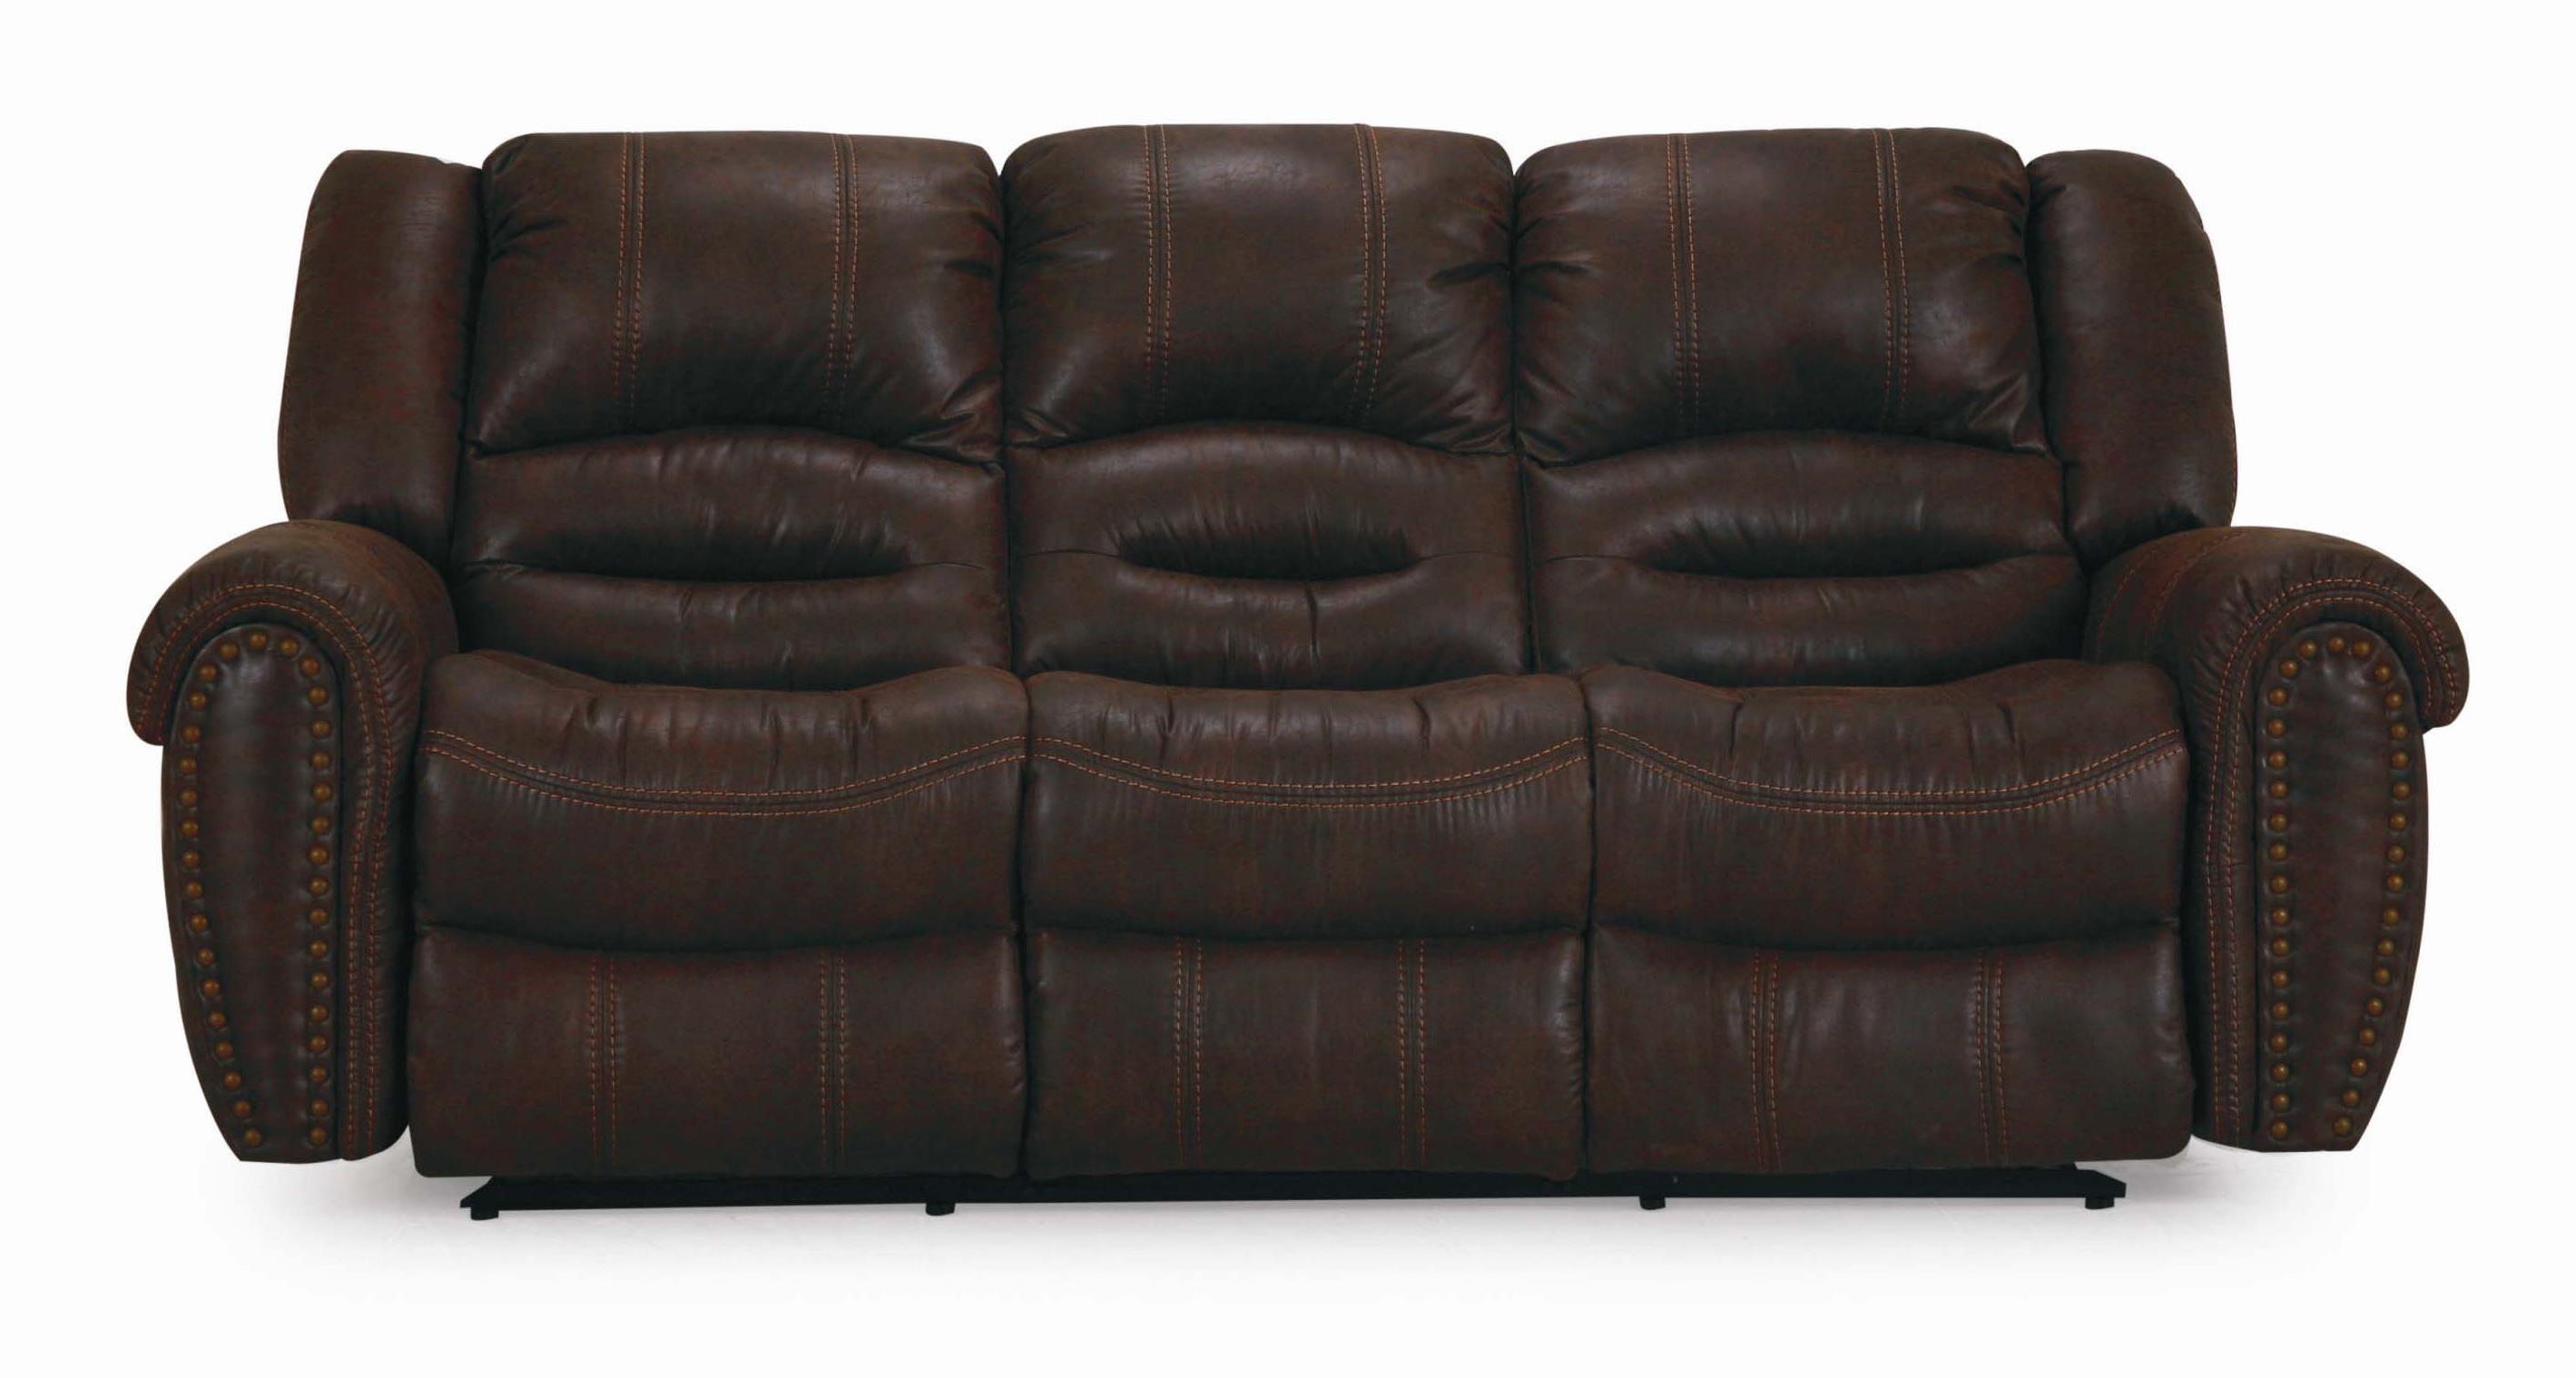 Cheers Sofa 8295 Reclining Sofa with Nailhead Trim  sc 1 st  Conlin\u0027s Furniture & Cheers Sofa 8295 Reclining Sofa with Nailhead Trim - Conlin\u0027s ... islam-shia.org